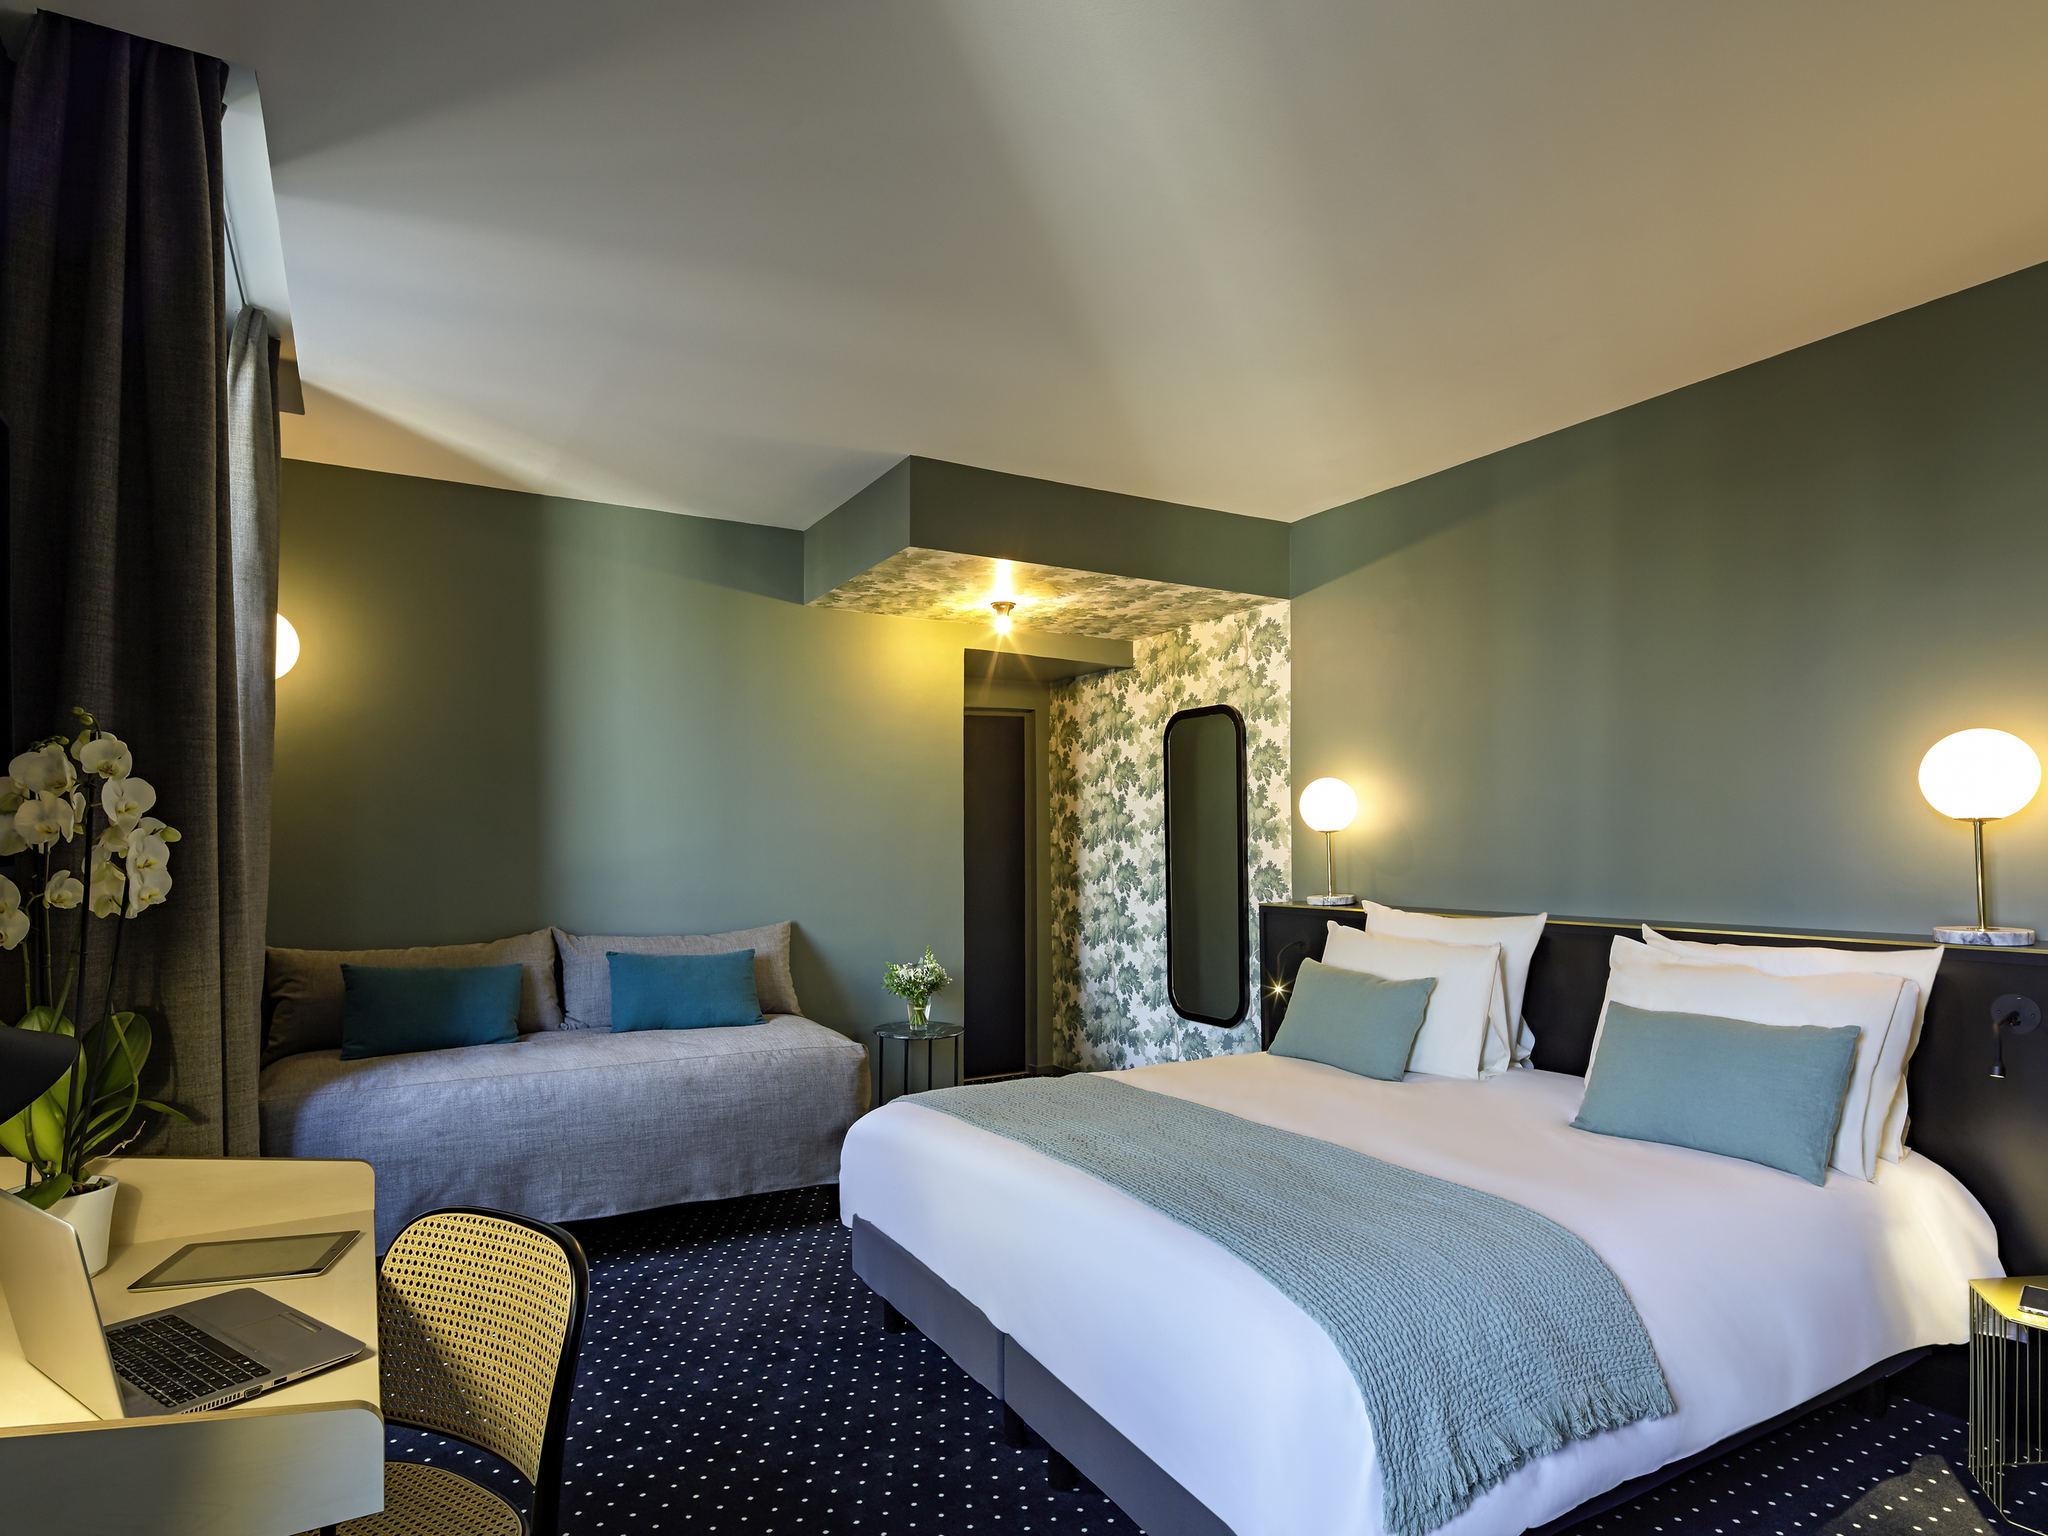 Hotel in NANTES - Nantes Centre Passage Pommeraye Hotel